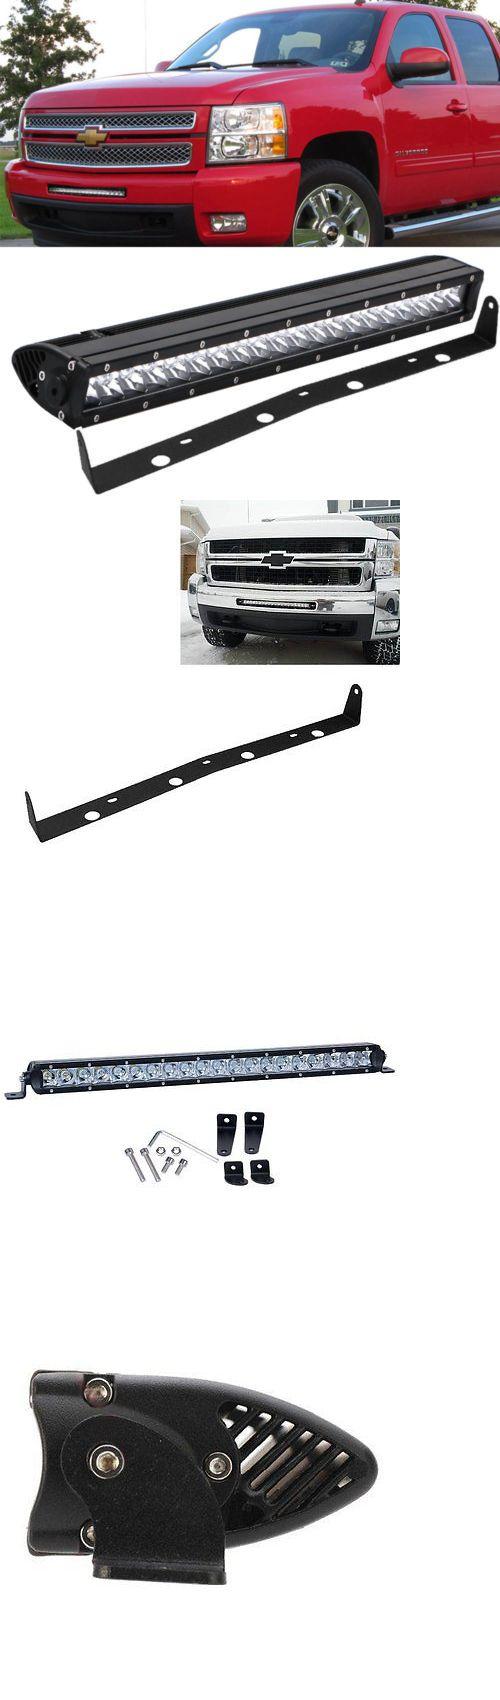 Car Lighting: Front Hidden Light Bar Mounts Bracket+ 20 Inch Led Light Bar Gmc Chevy Silverado -> BUY IT NOW ONLY: $102.98 on eBay!